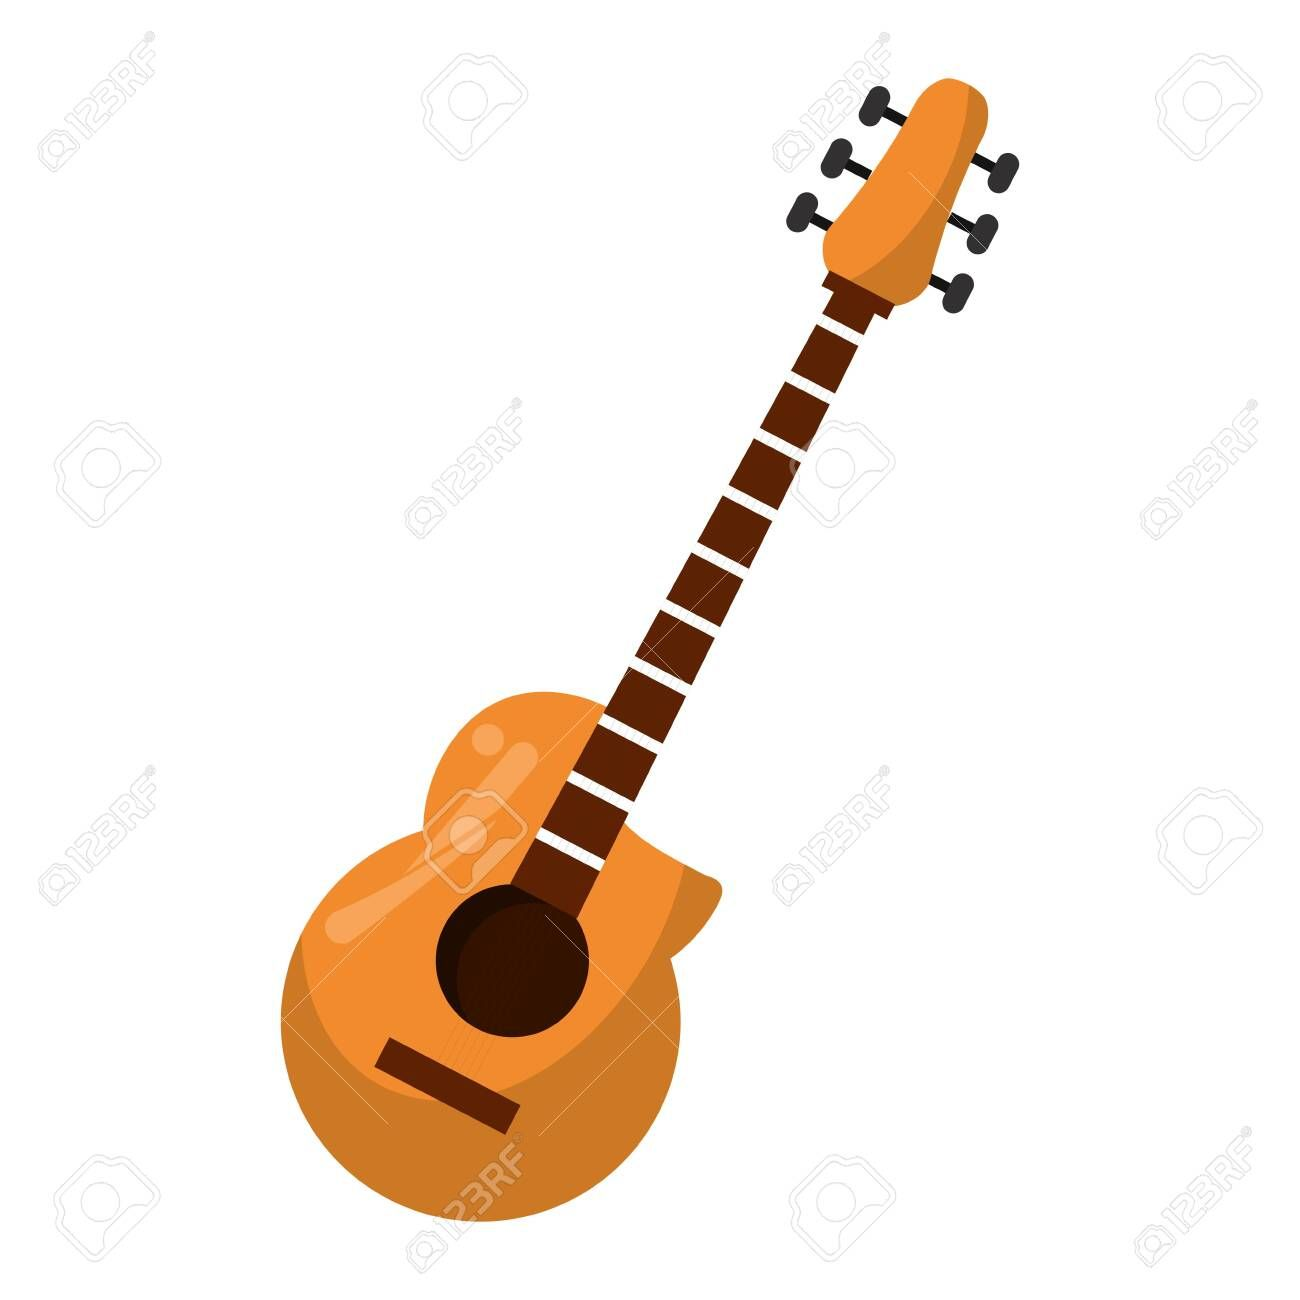 Acoustic Guitar Music Instrument Vector Illustration Graphic Design Aff Music Instrumen Acoustic Guitar Music Typography Design Layout Typography Design